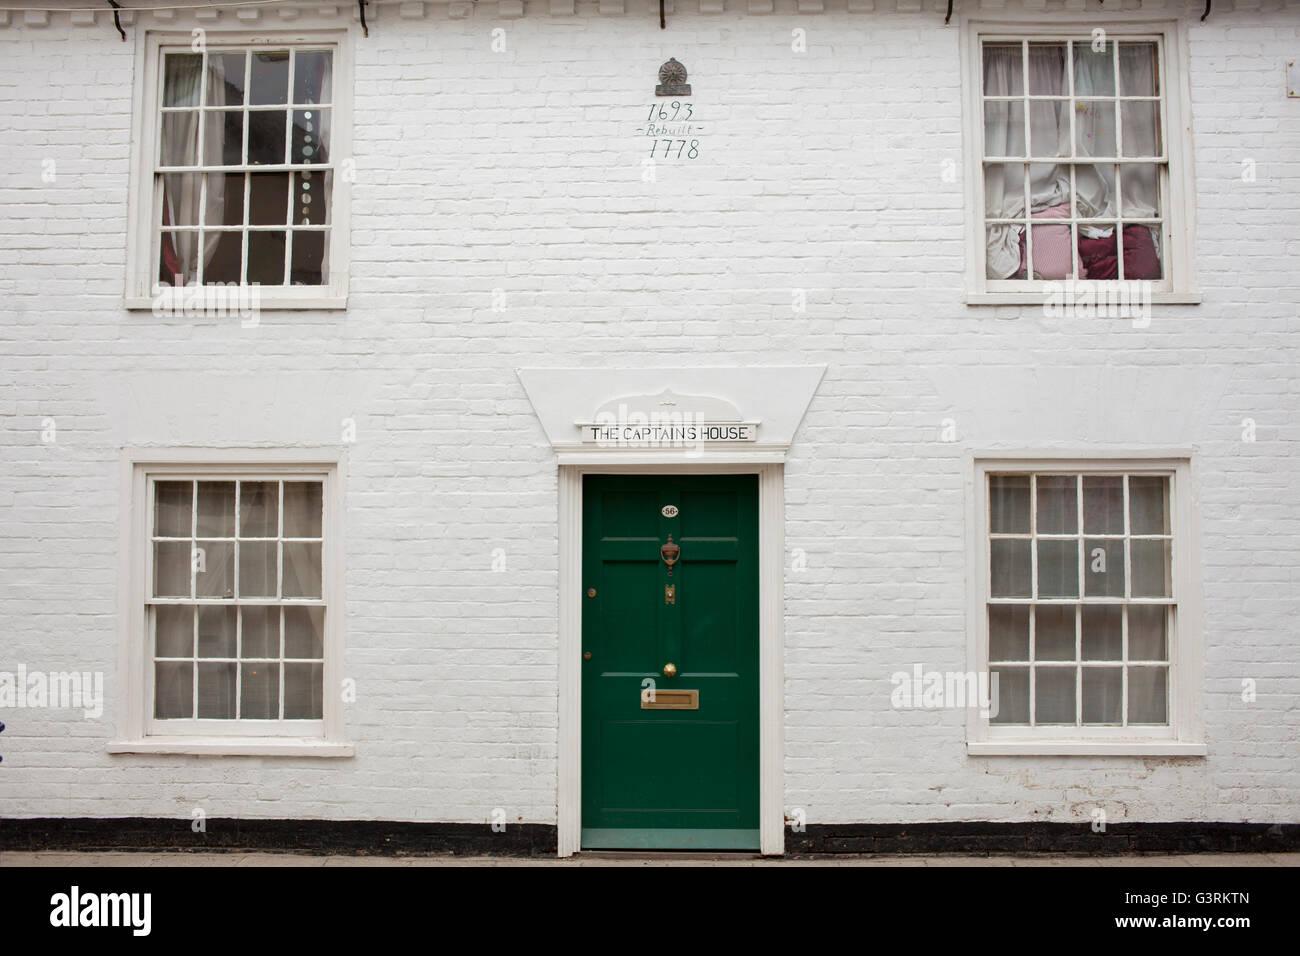 The Captains House a white symmetrical house Whitstable Kent - Stock Image & Symmetrical House Stock Photos \u0026 Symmetrical House Stock Images - Alamy